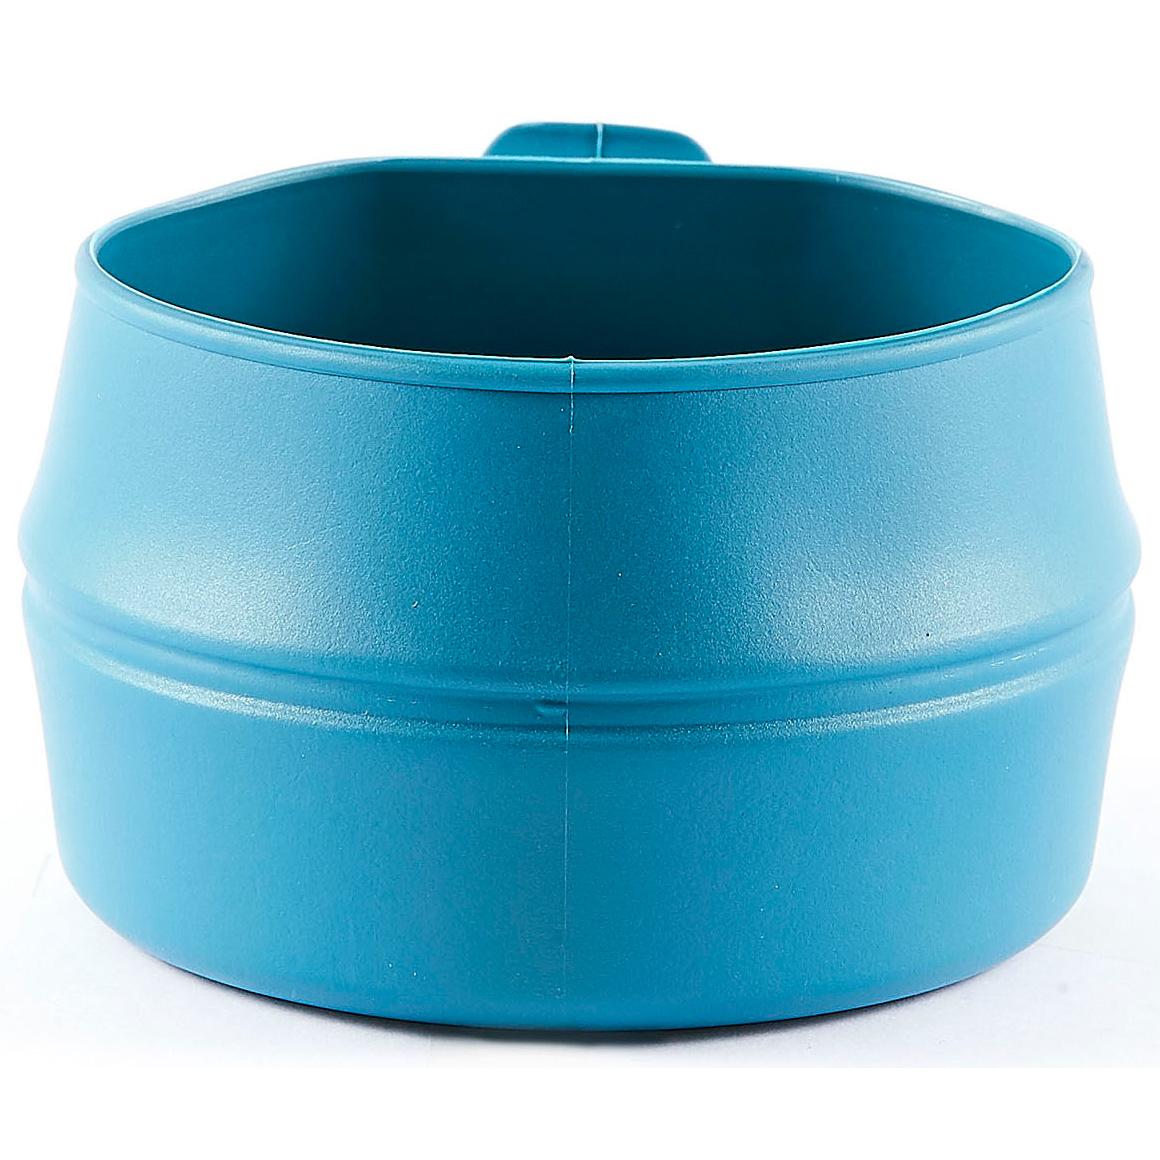 Wildo Fold-A-Cup Green - Azure